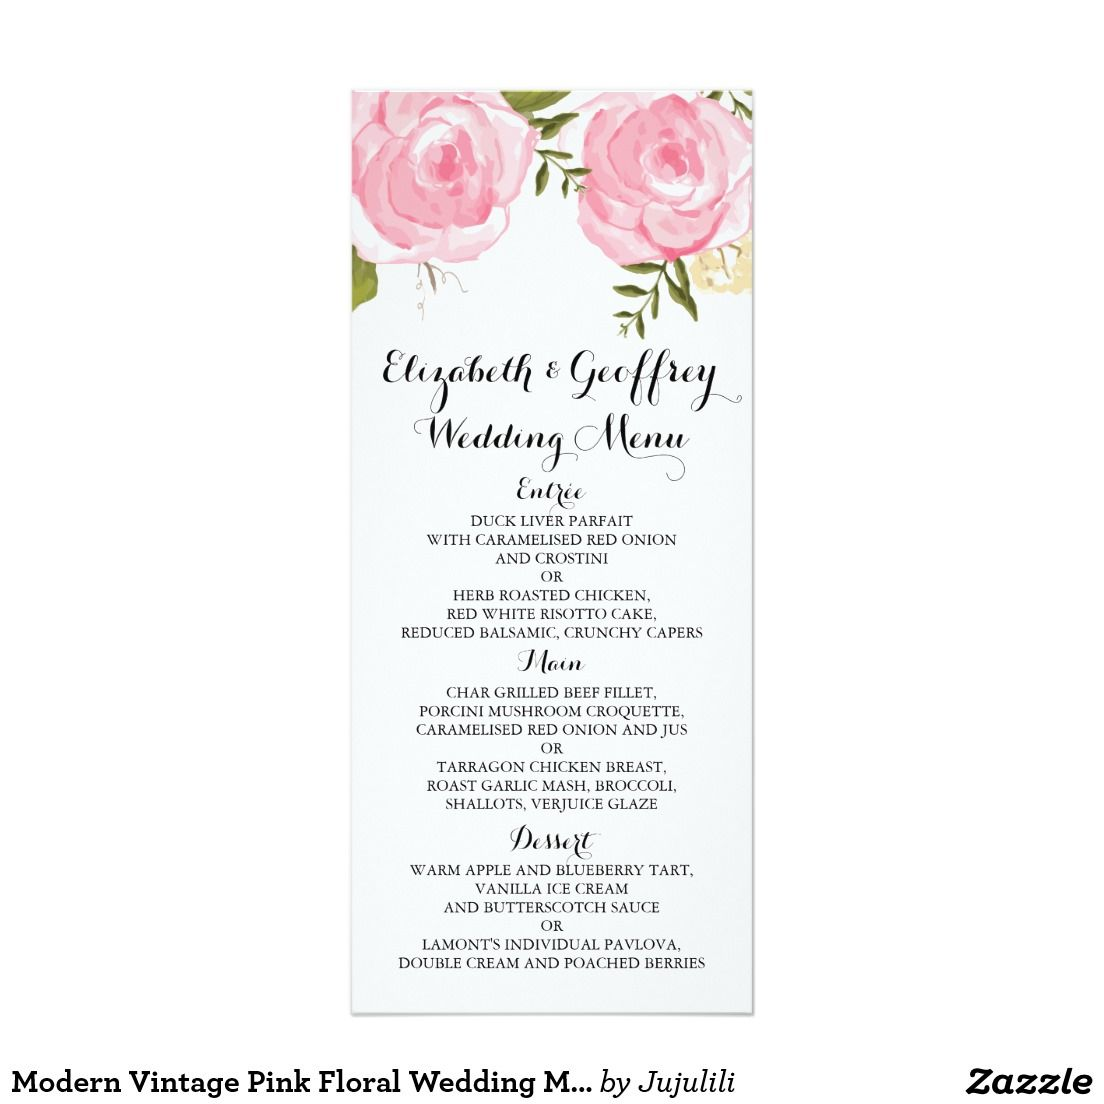 Modern Vintage Pink Floral Wedding Menu Card | Logo | Pinterest ...